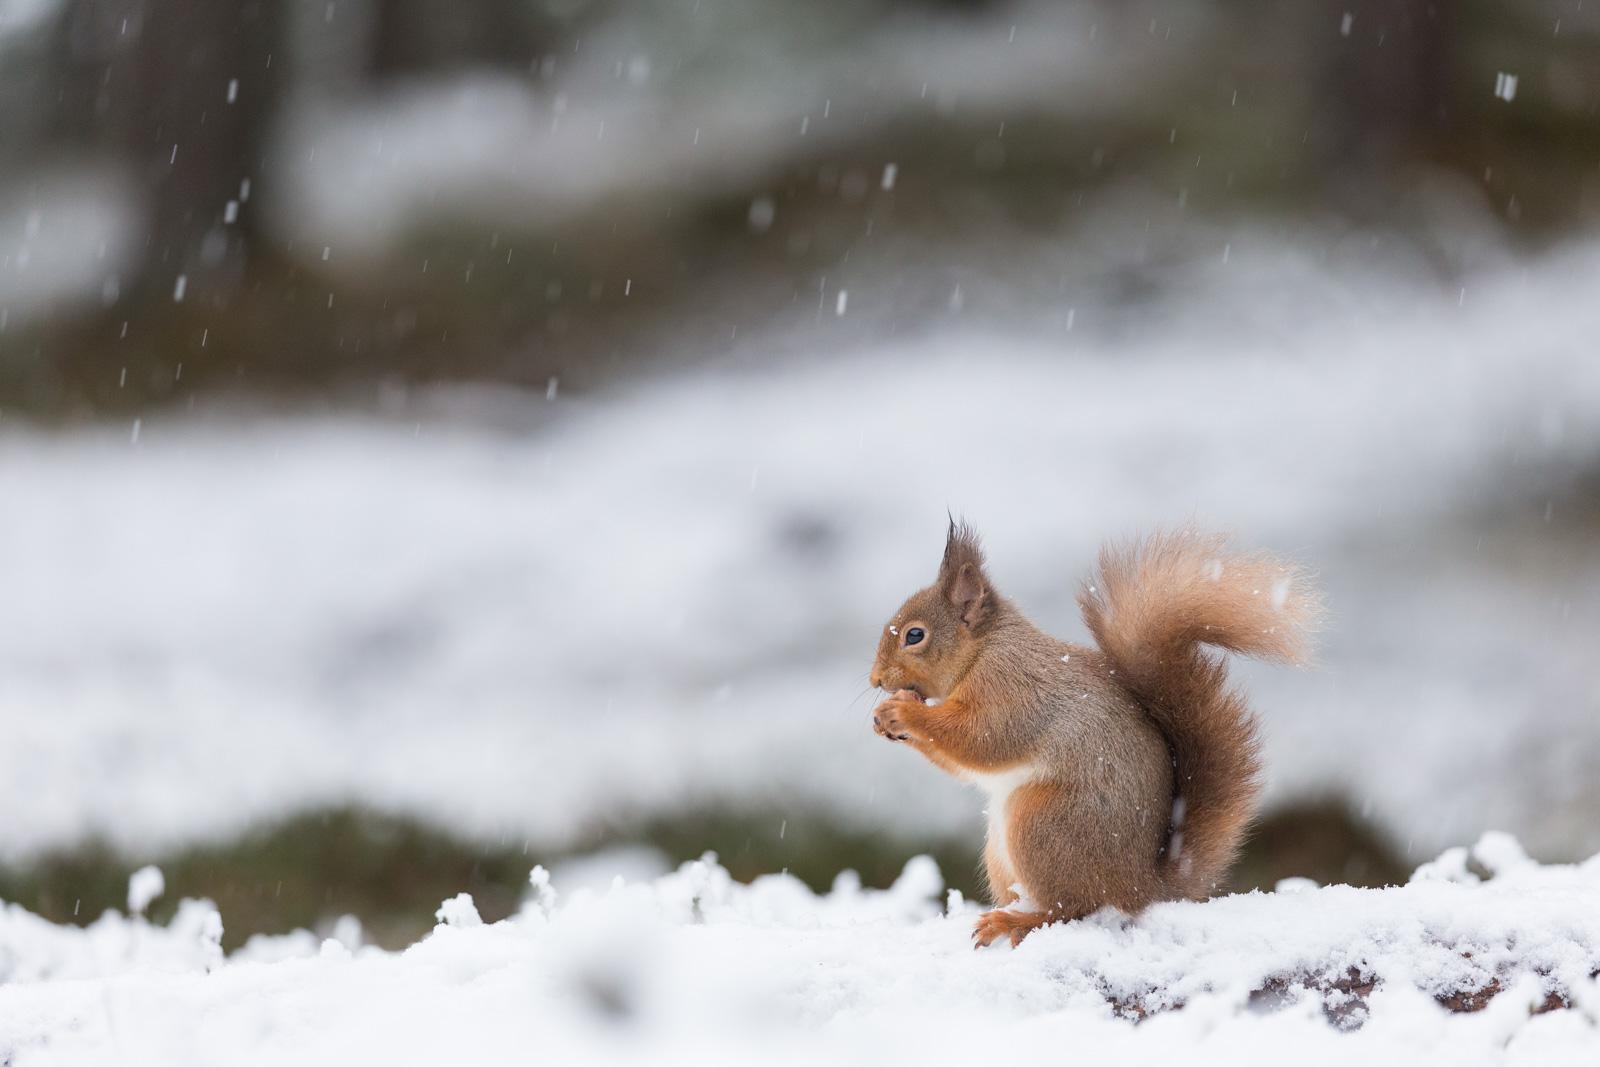 Sigma 500mm f/4 DG OS HSM Sport Lens - Sample image of red squirrel.